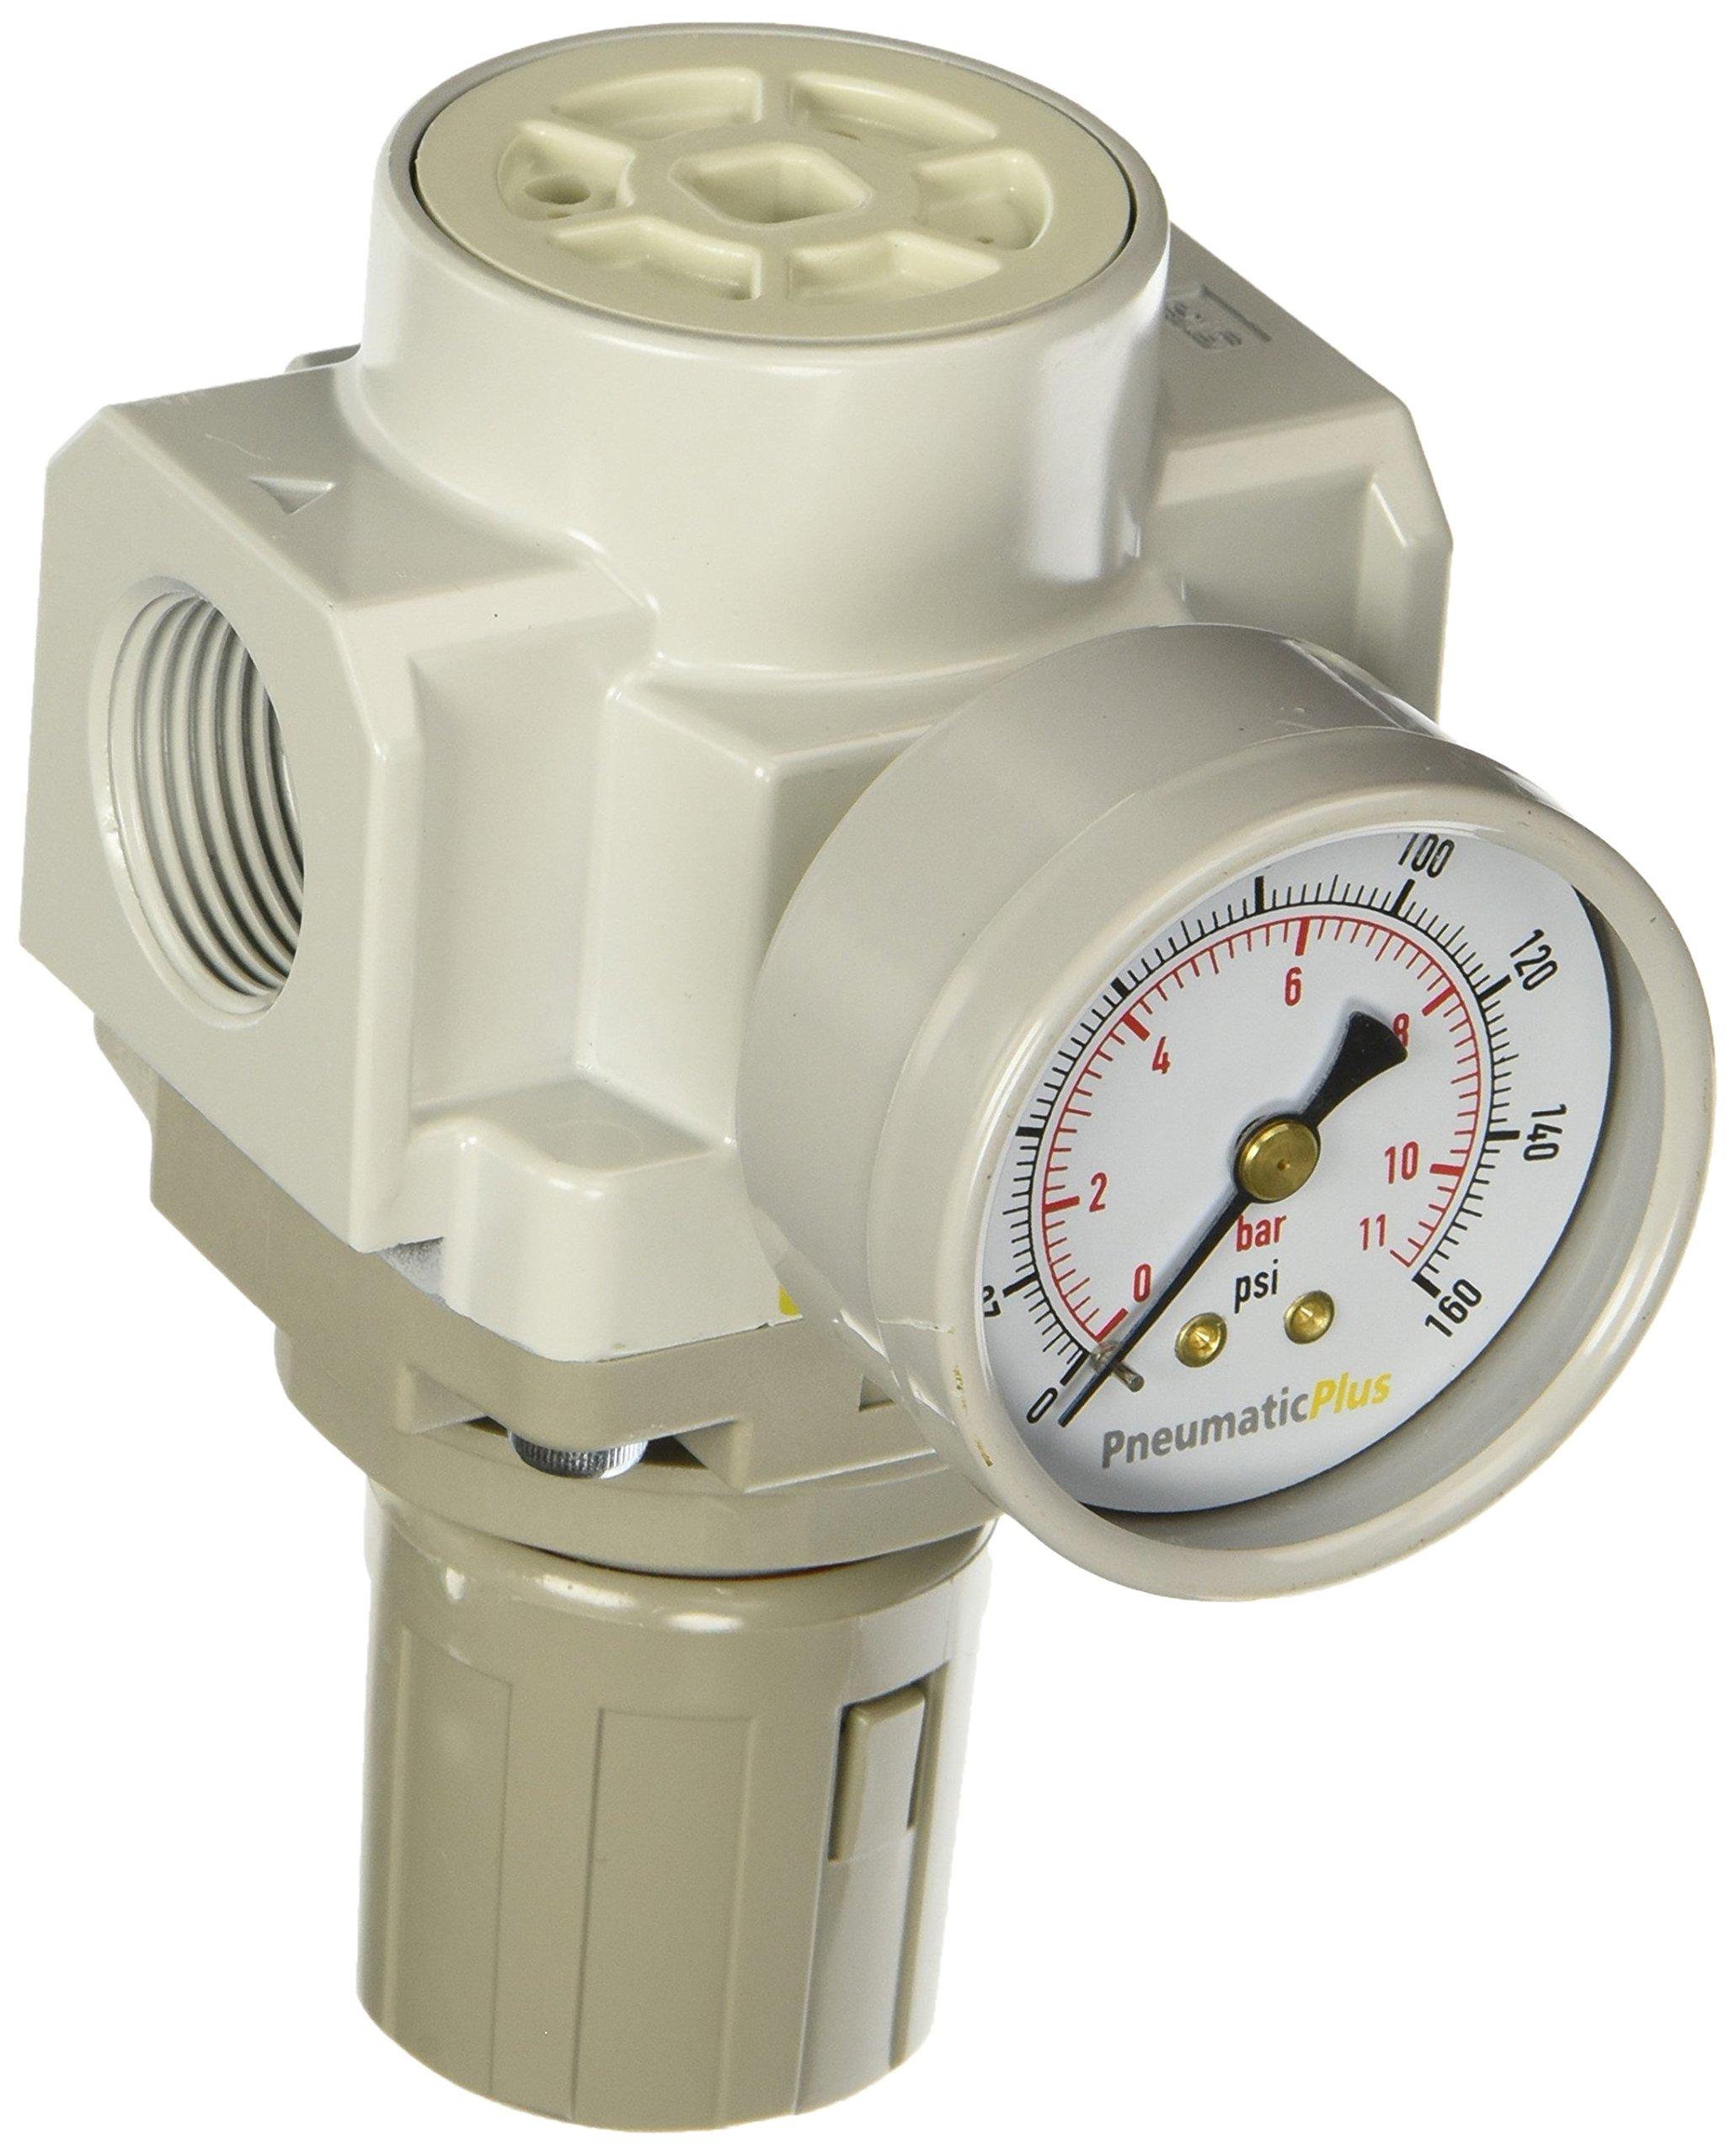 galleon water pressure regulator brass lead free adjustable water pressure. Black Bedroom Furniture Sets. Home Design Ideas